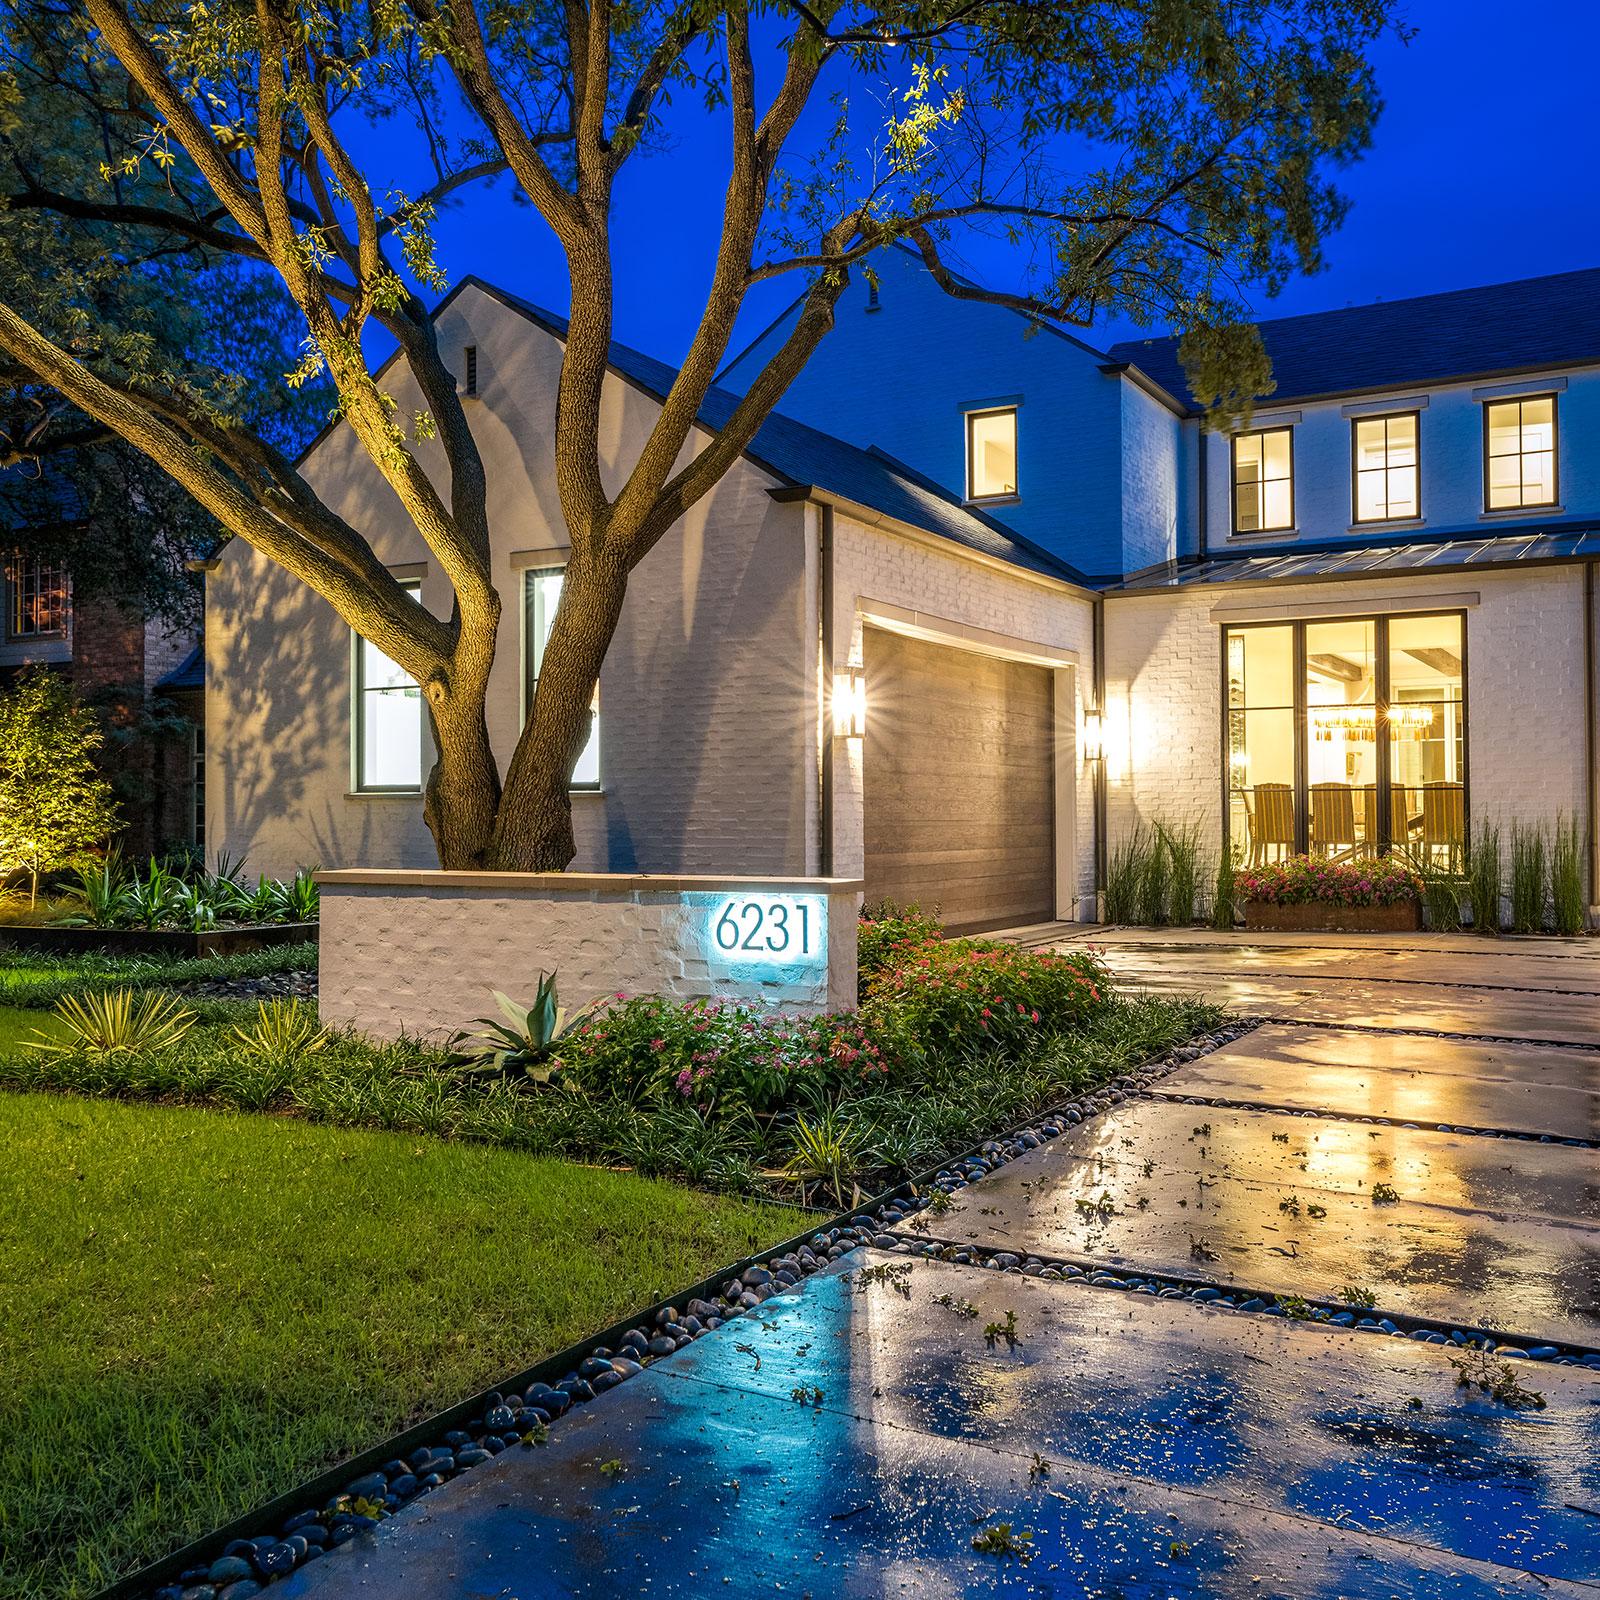 ddla-design-pemberton-modern-front-entry-driveway-evening.jpg